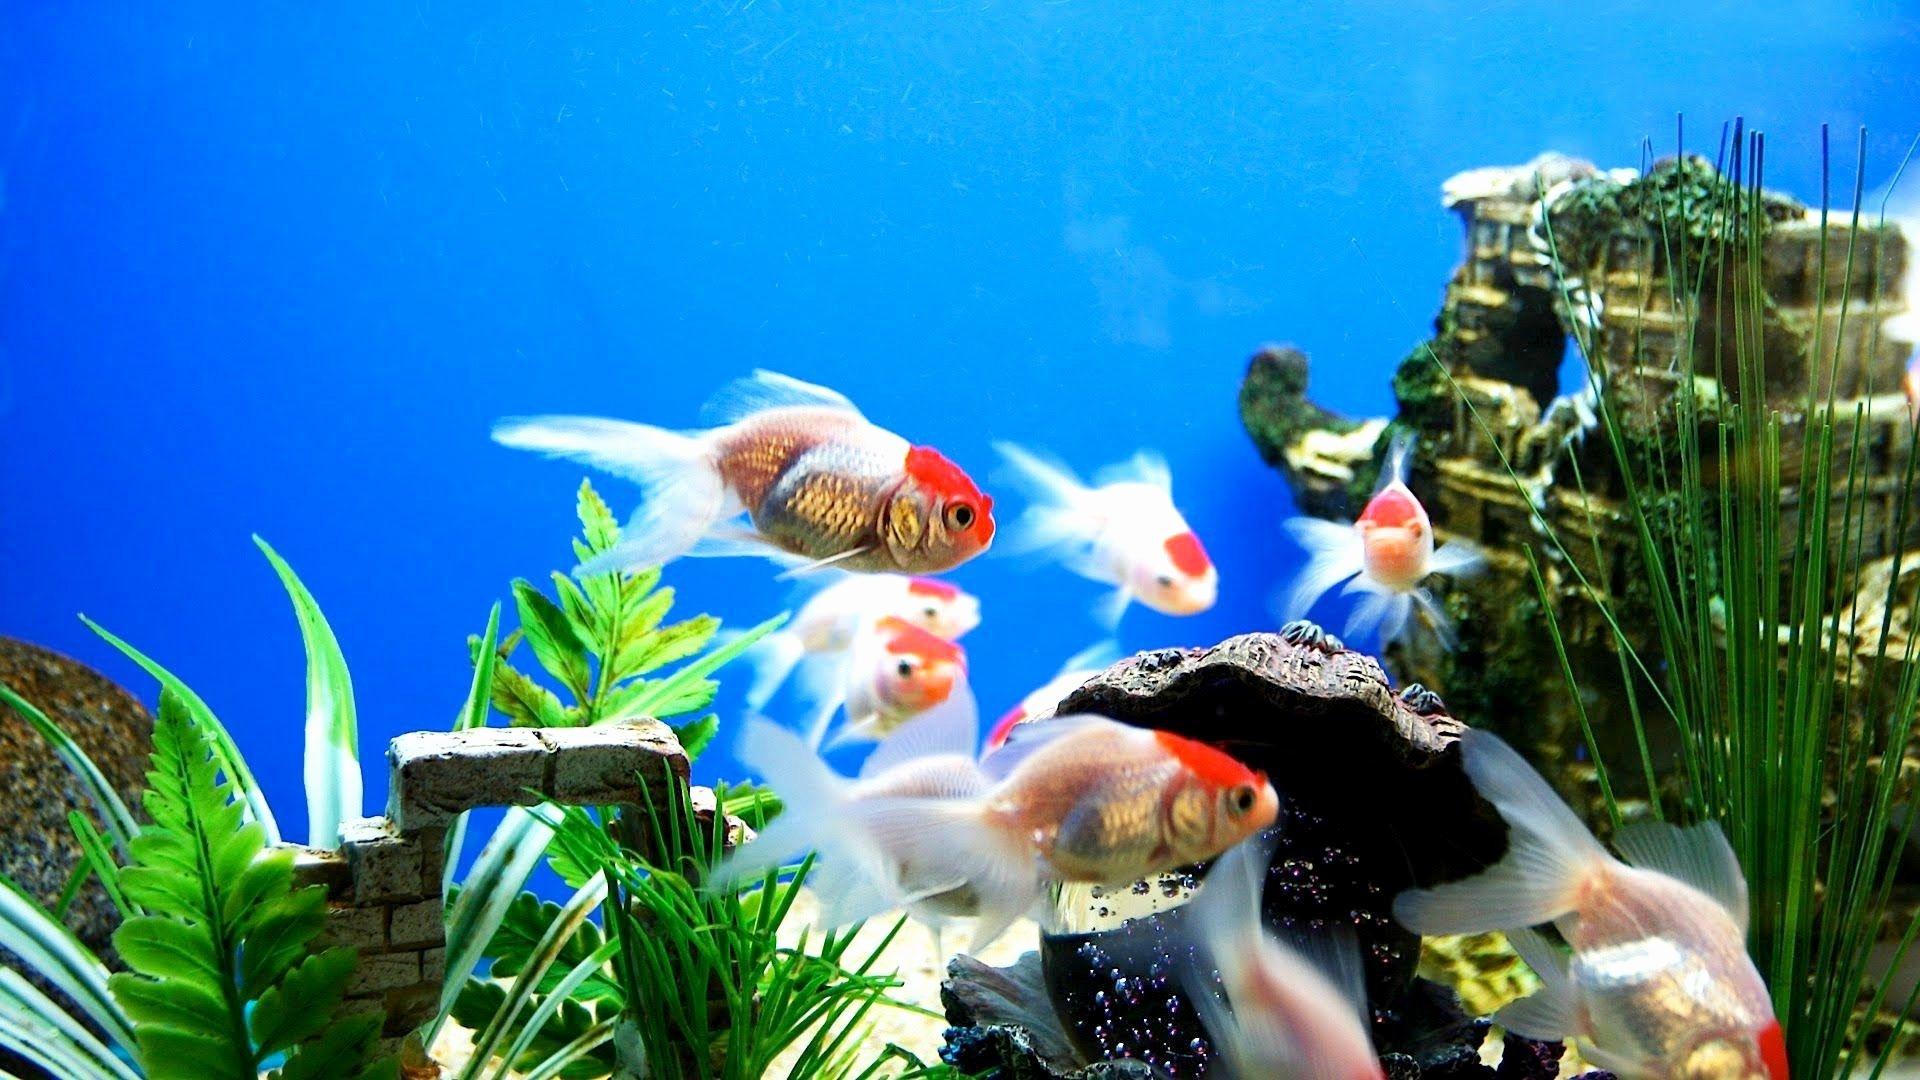 Cool Fish Tank Backgrounds Elegant Fish Tank Wallpapers Wallpaper Cave